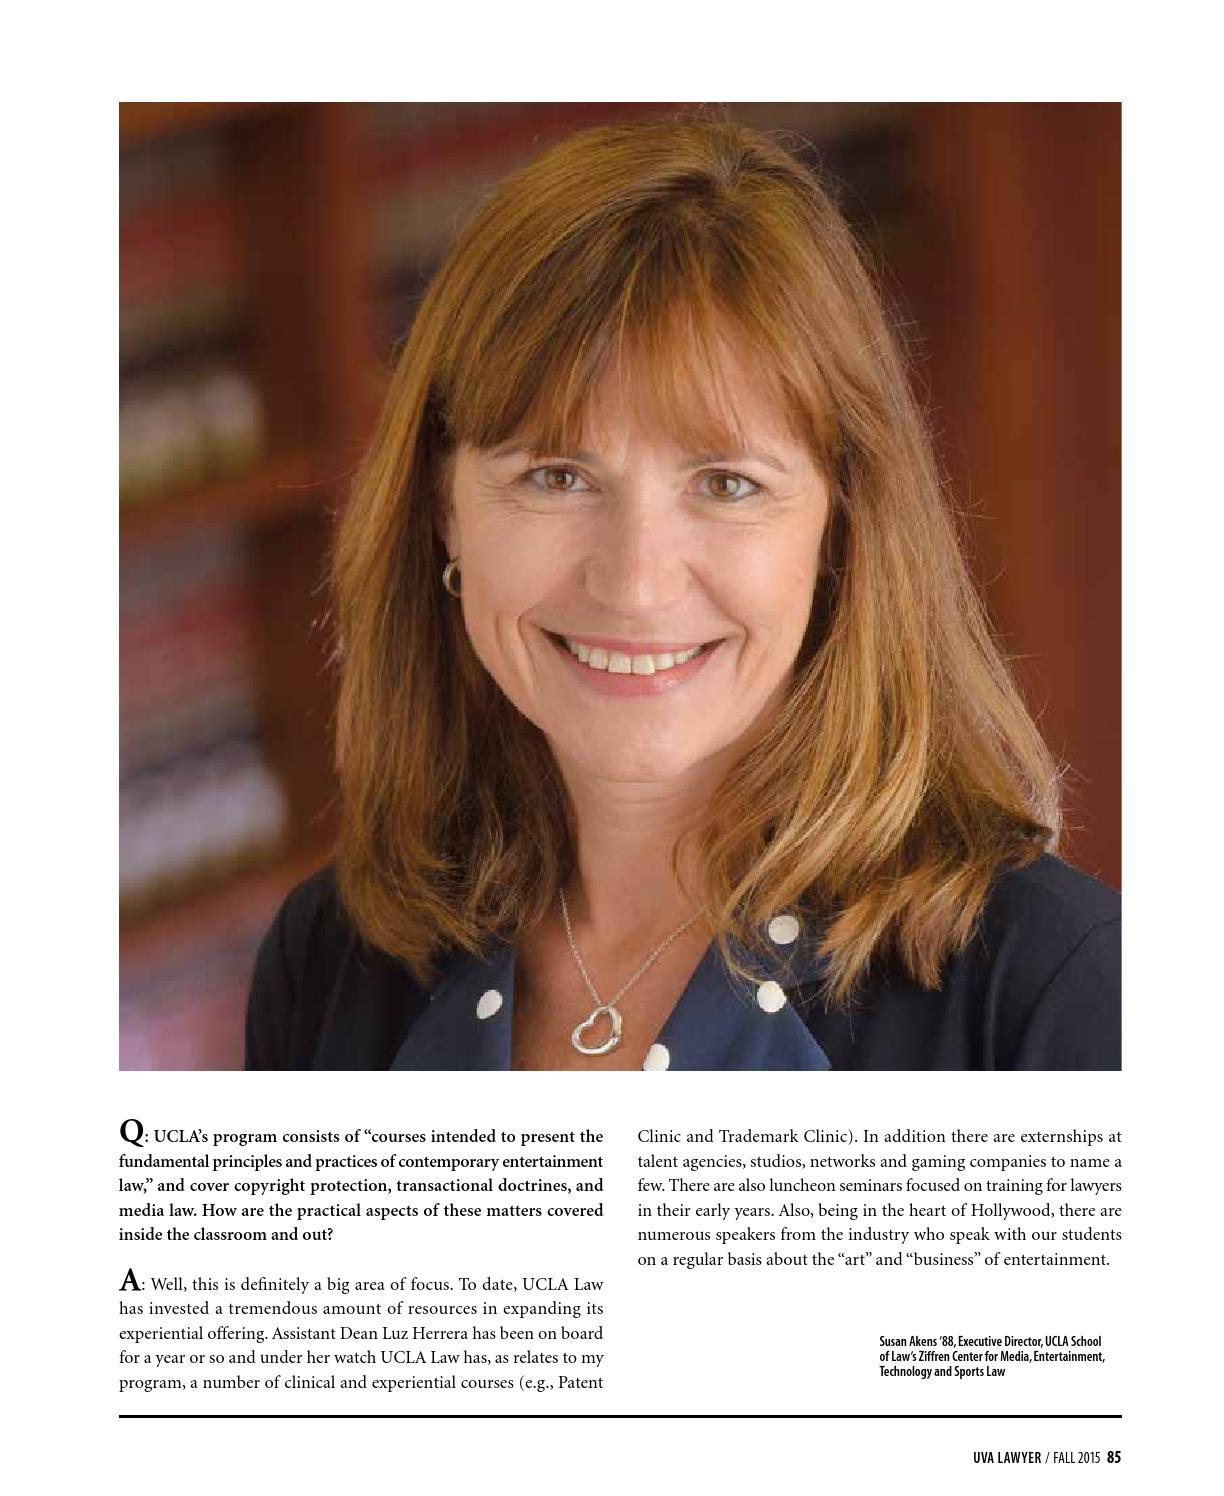 UVA Lawyer, Fall 2015 by University of Virginia School of Law - issuu